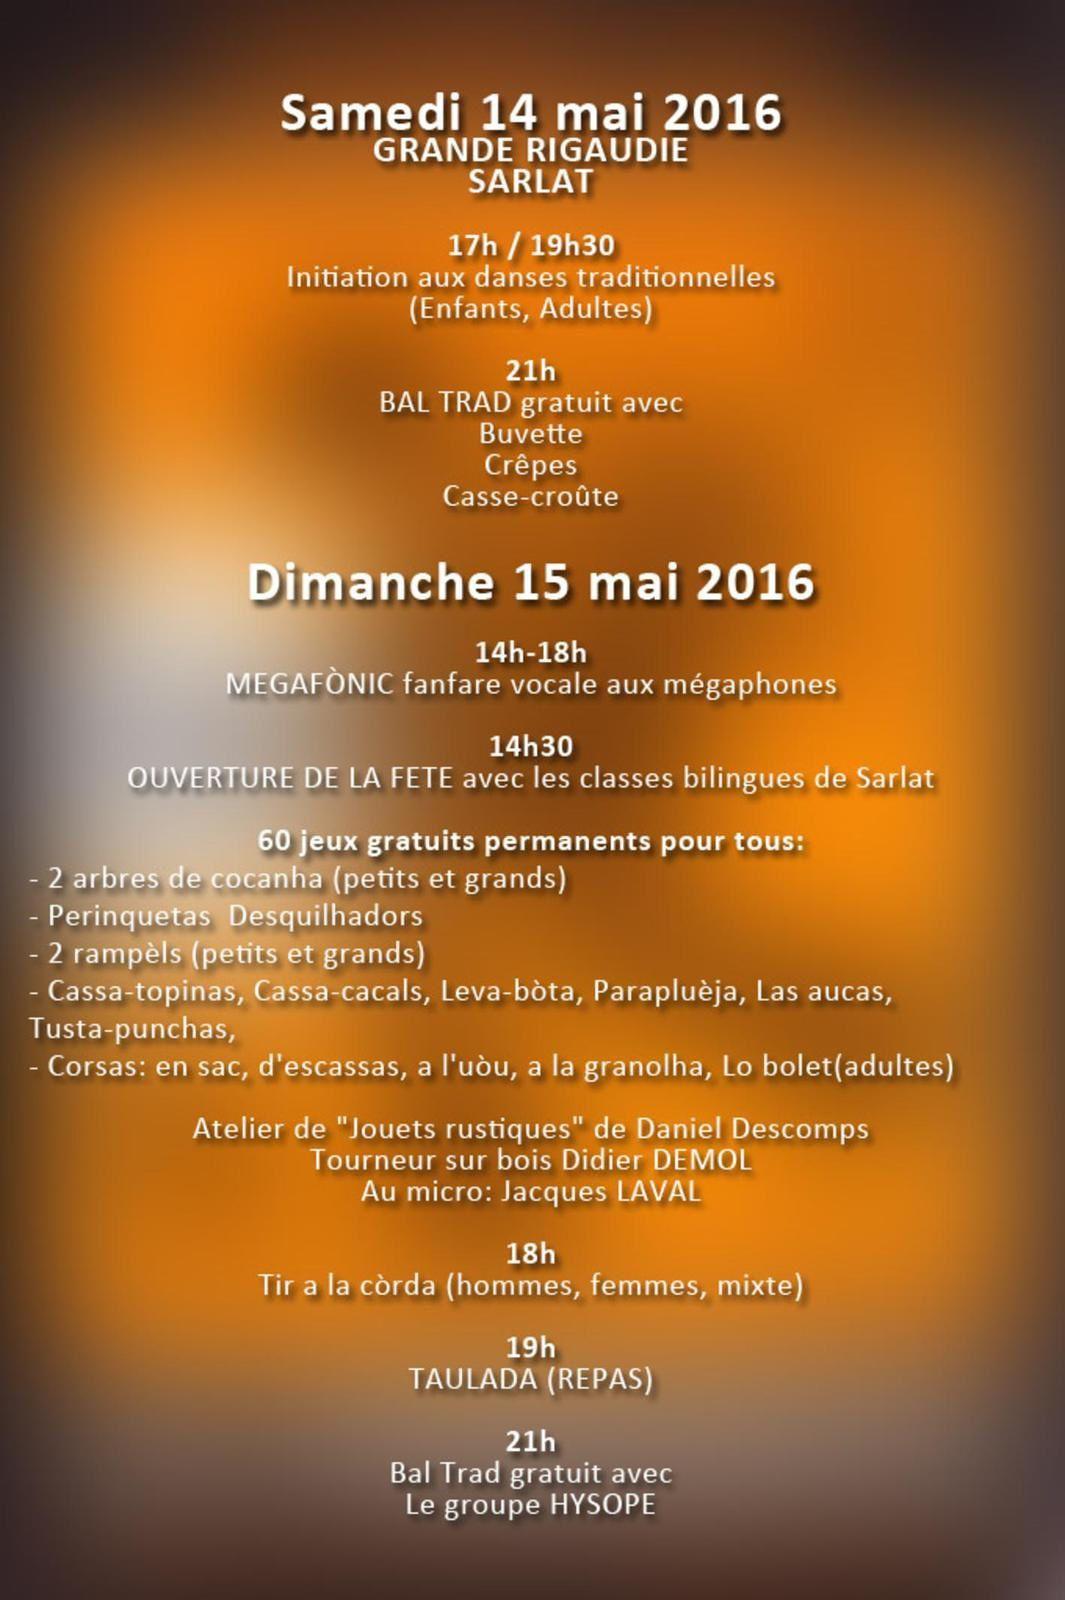 Sarlat La Ringueta 2016 bal folk avec hysope le 15 mai